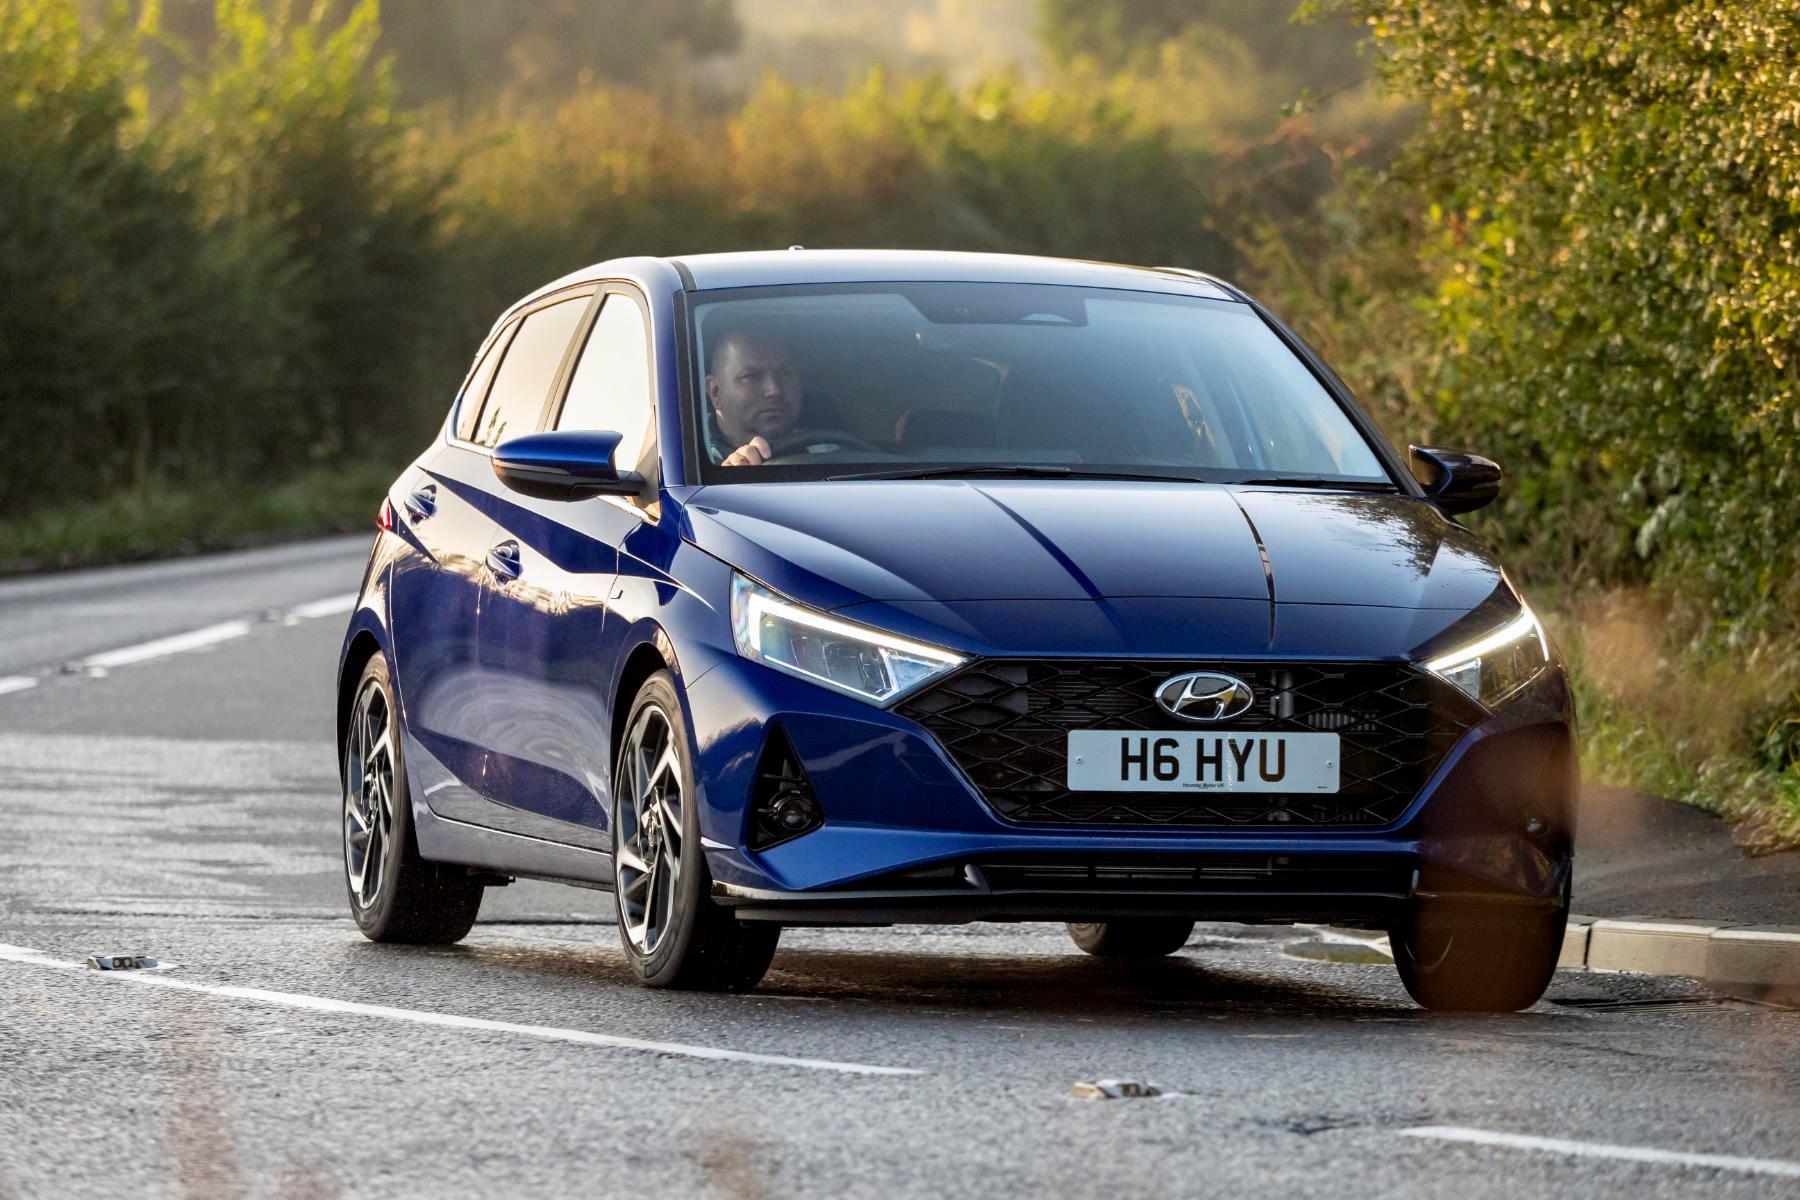 Kekurangan Toyota I20 Perbandingan Harga